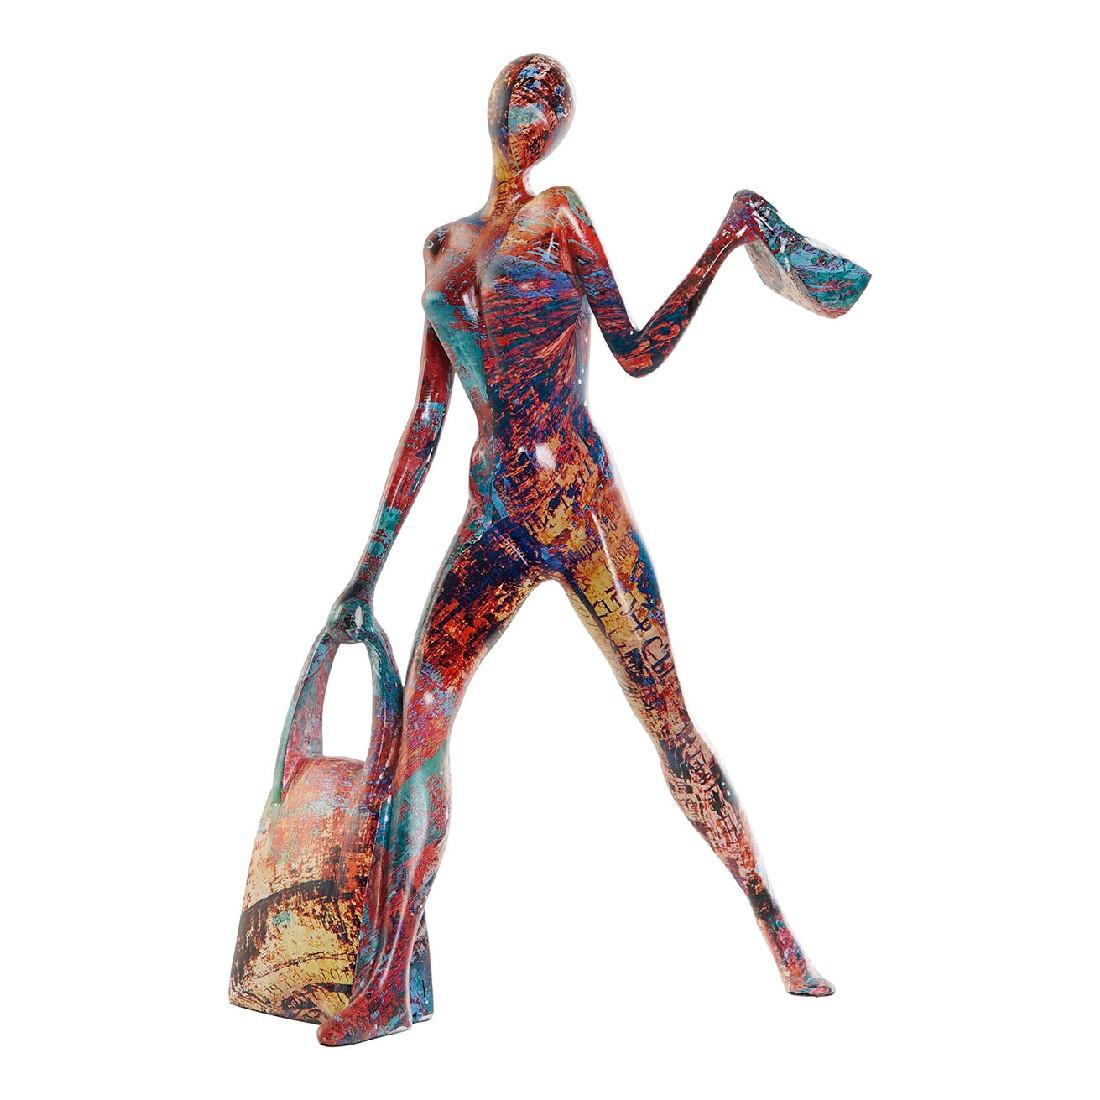 Figurine Fashion 18x27cm Résine Multicolore